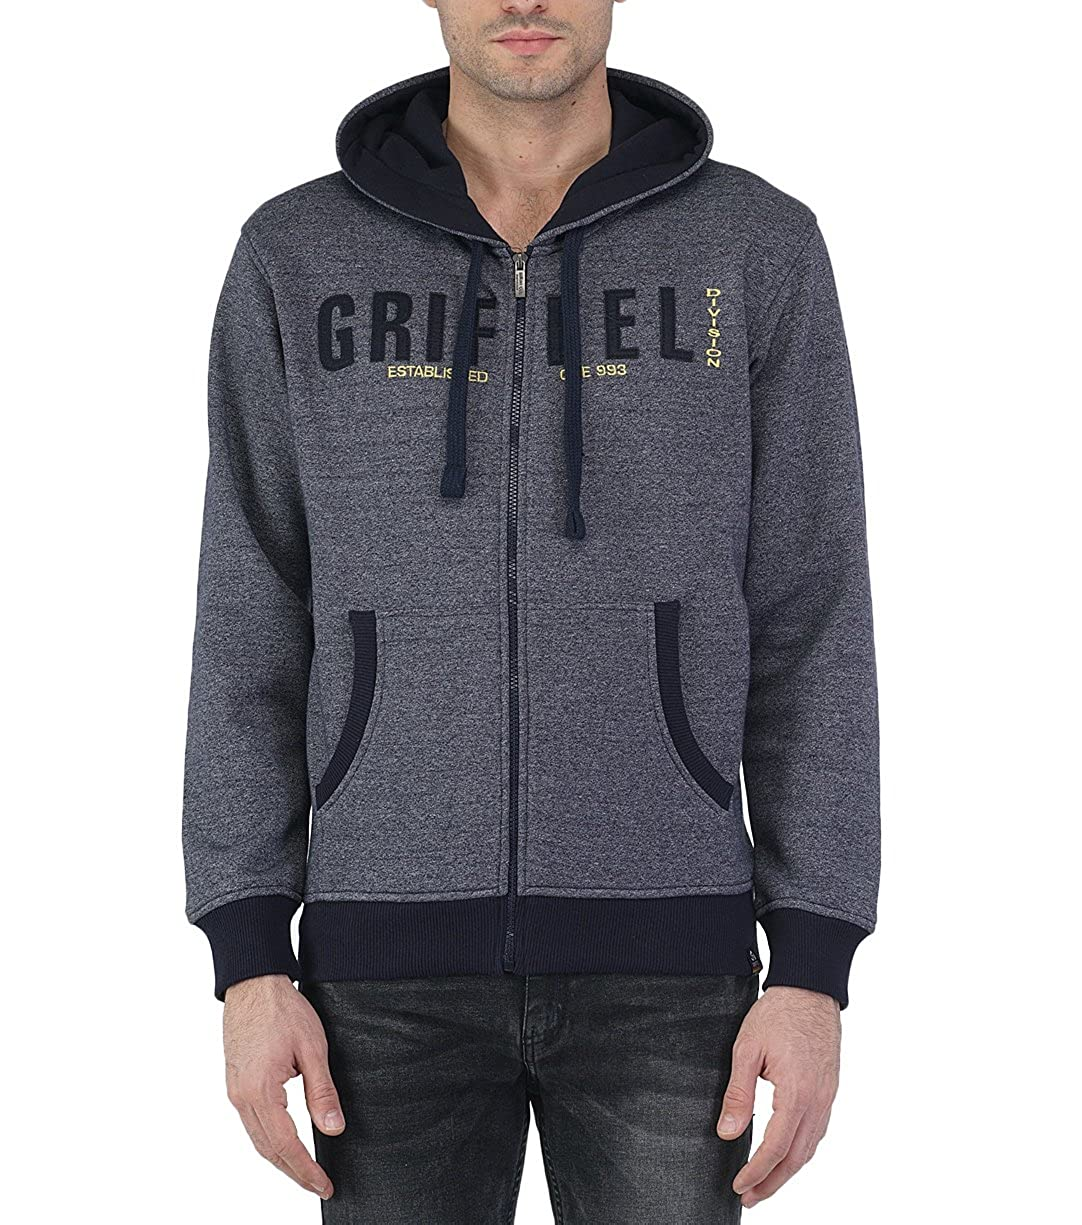 Anthra XLarge Griffel Mens Sweatshirts